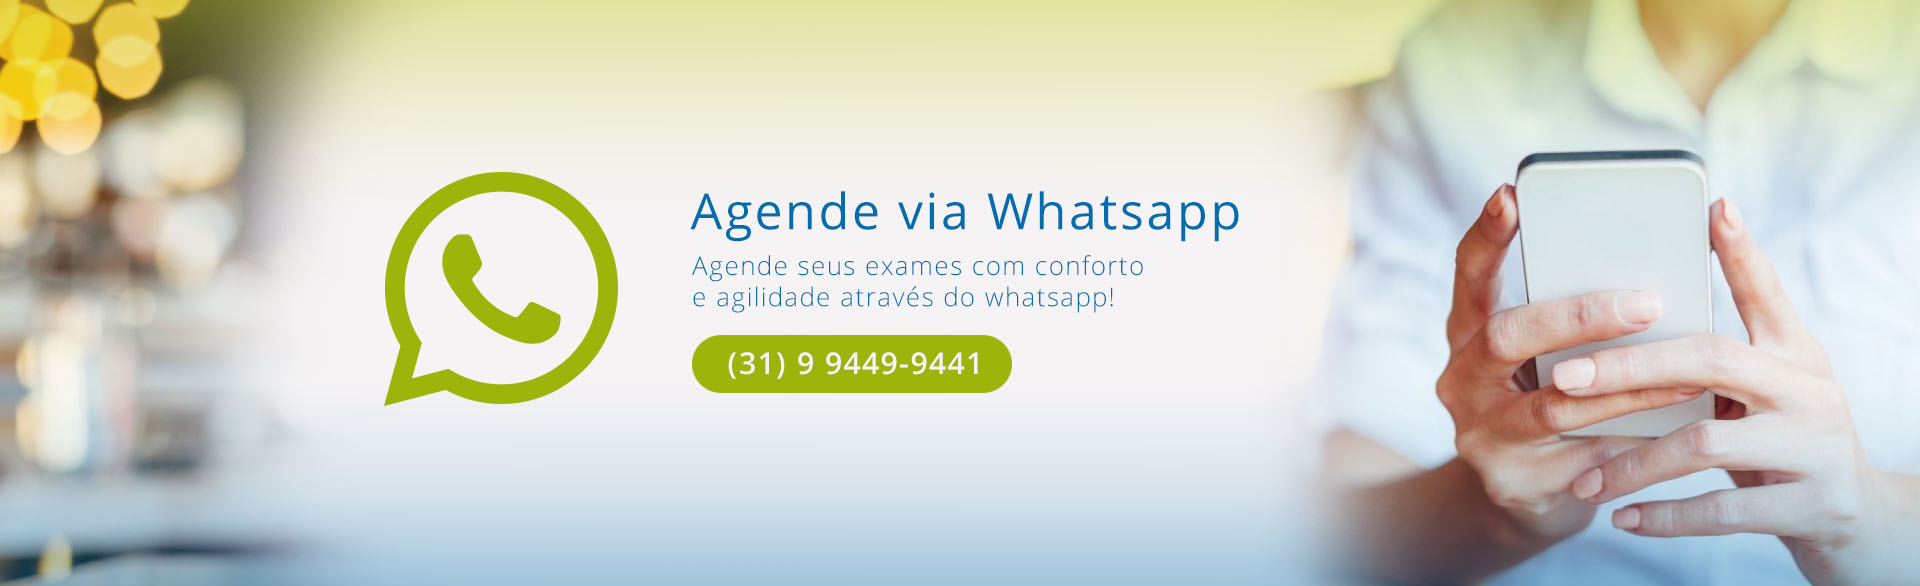 agendamento de exames via whatsapp